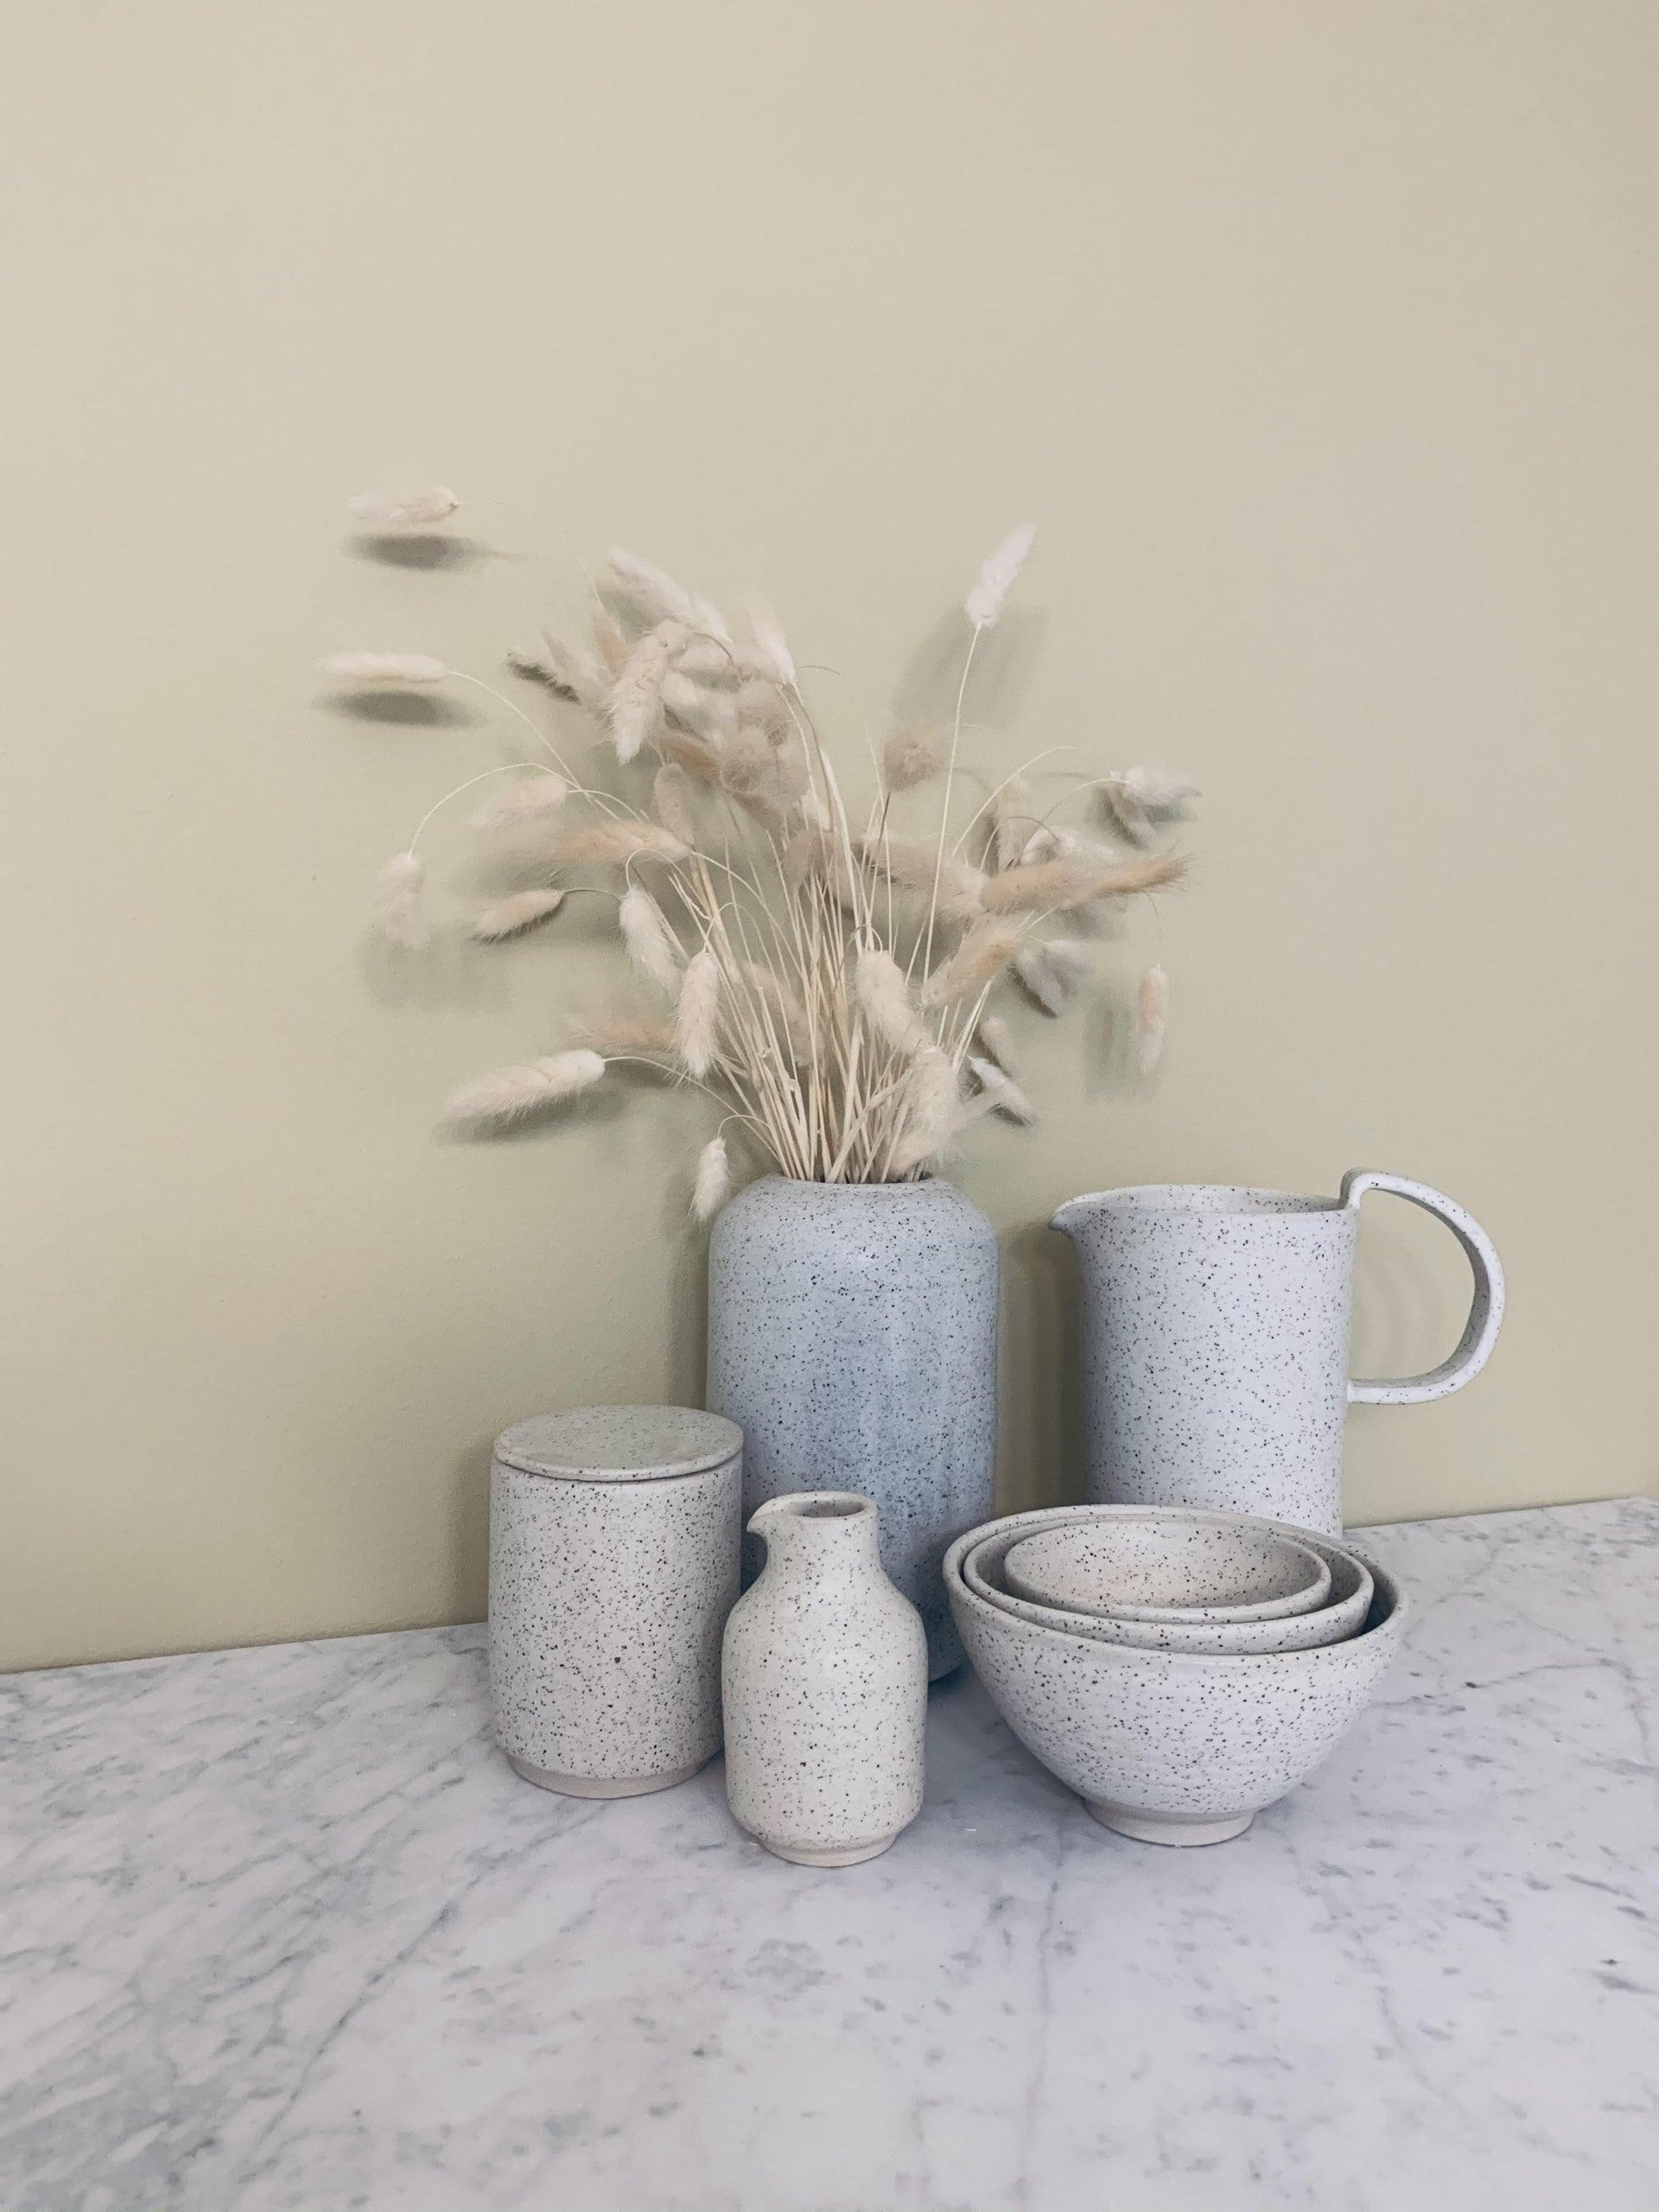 30 carrara-marmor-arki-bordplade